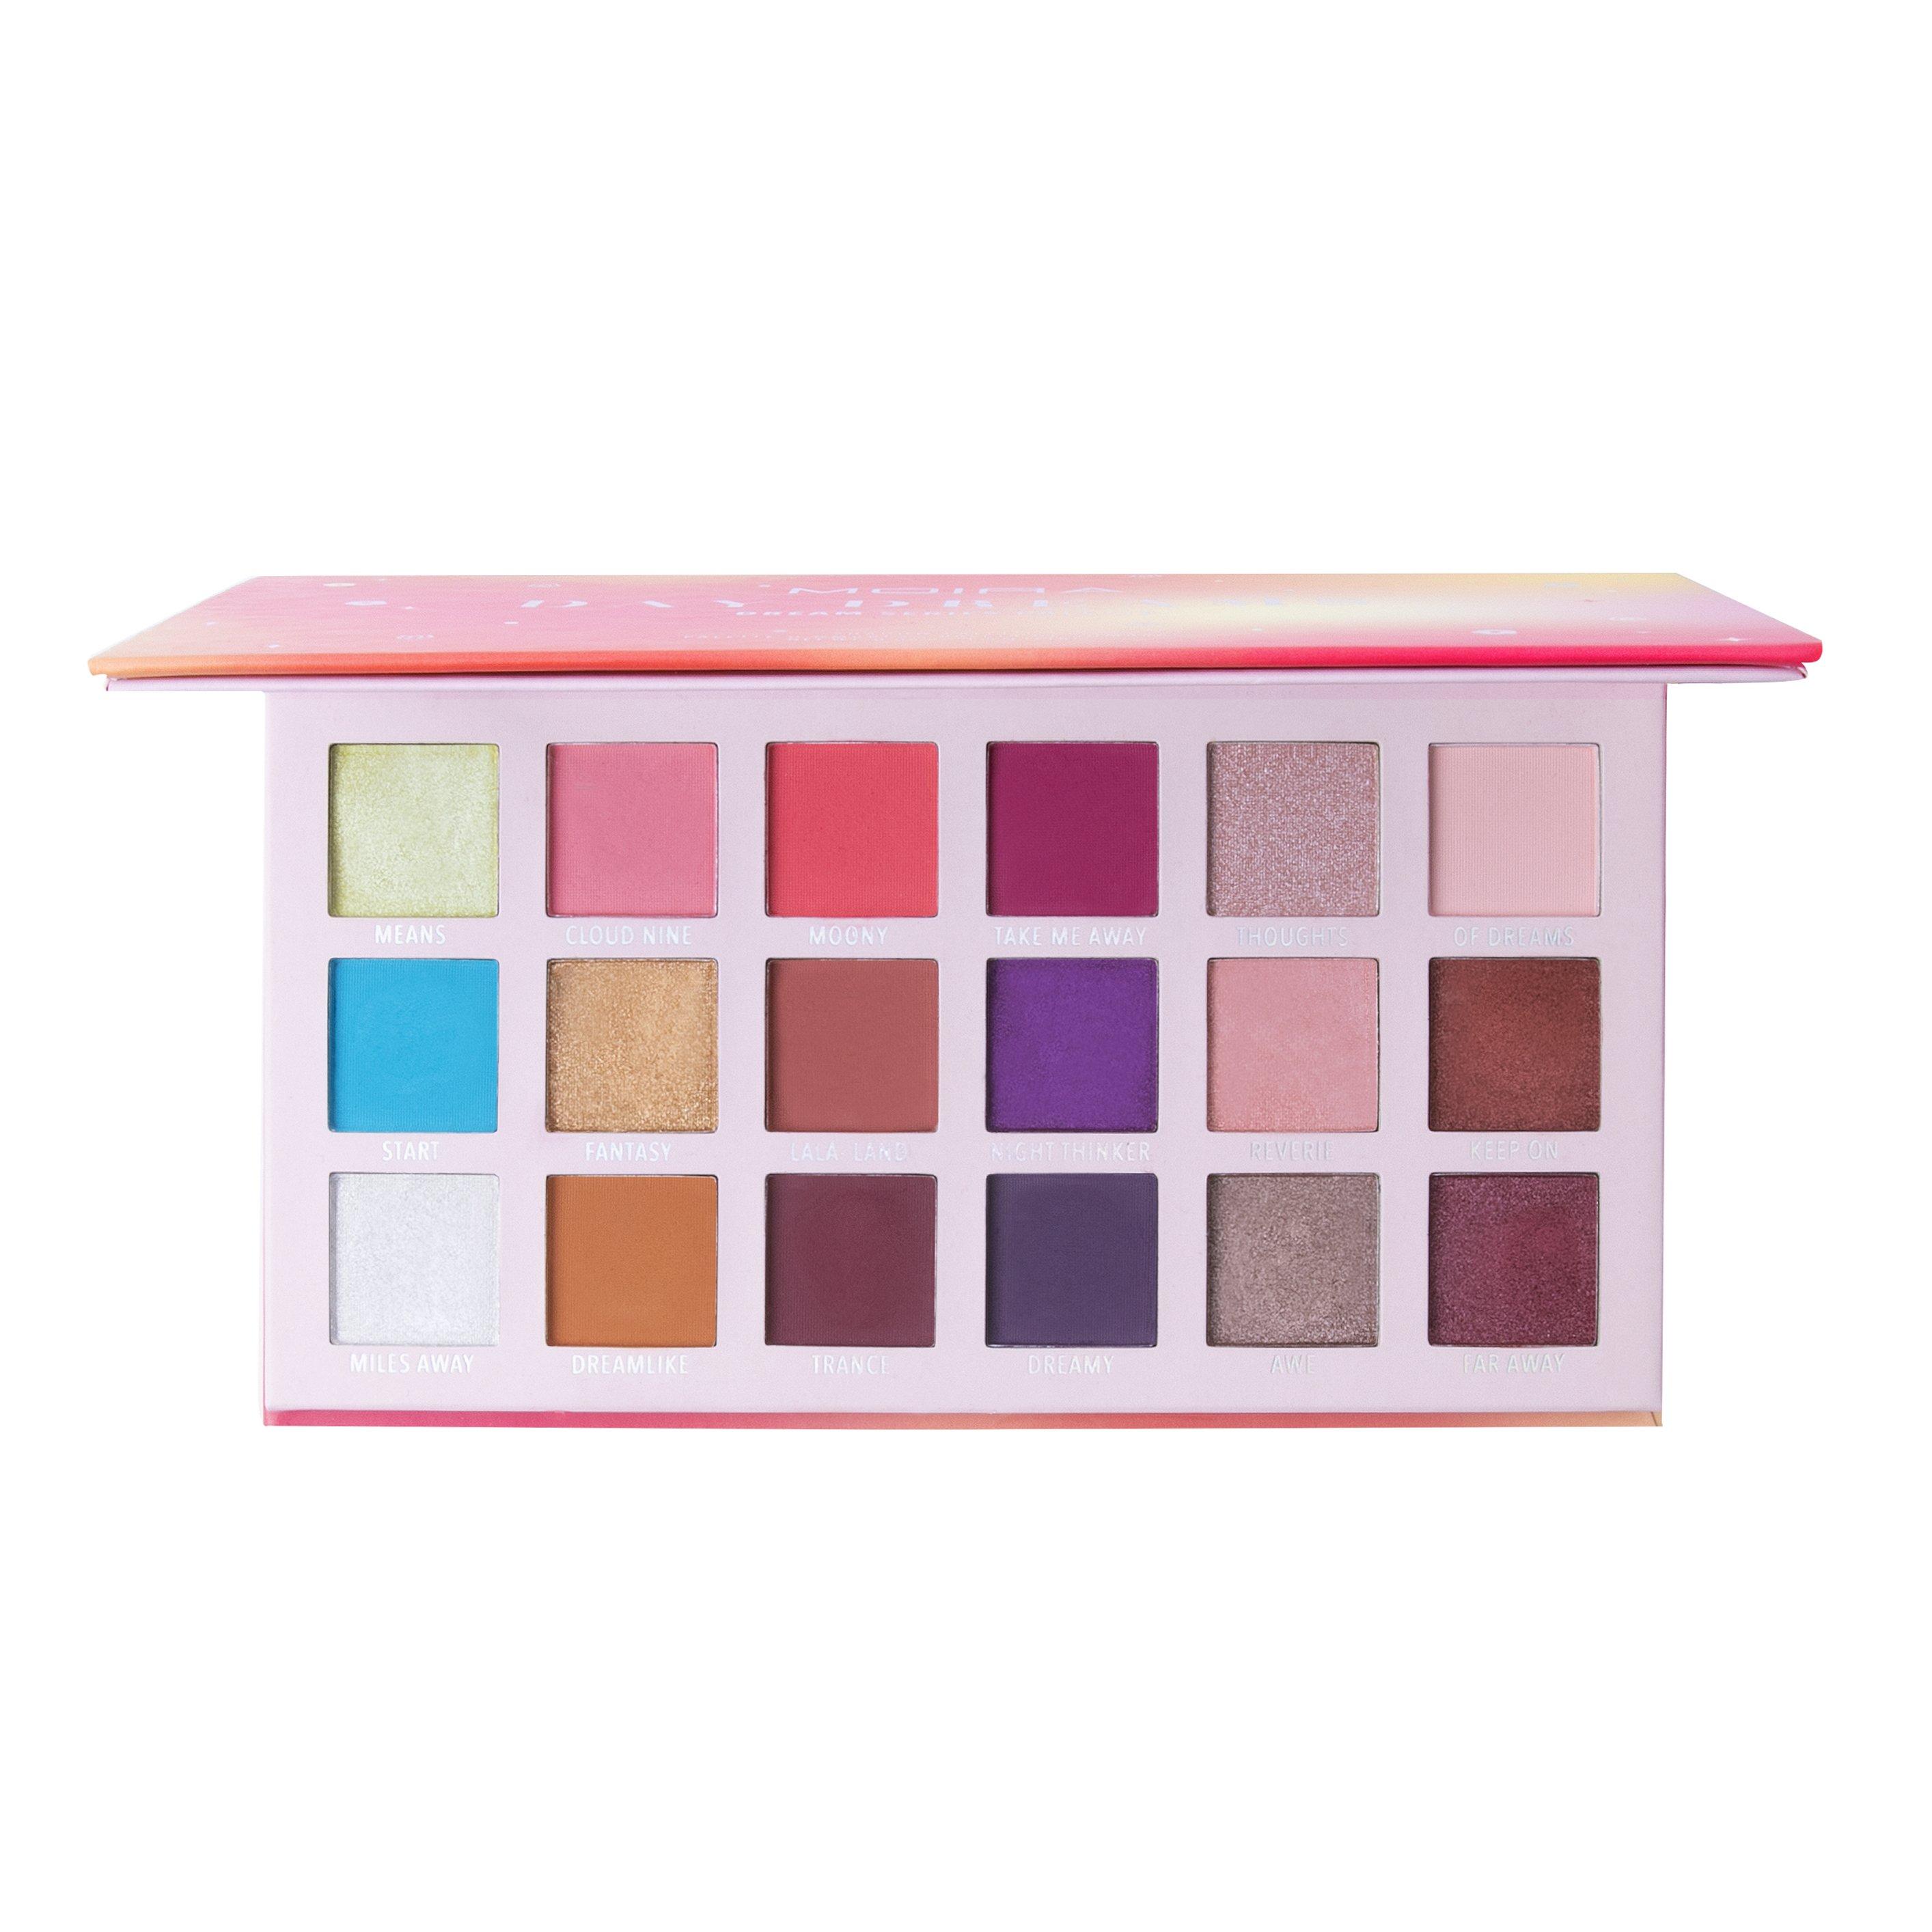 Day dreams dream palette in 2019 i heart makeup palette